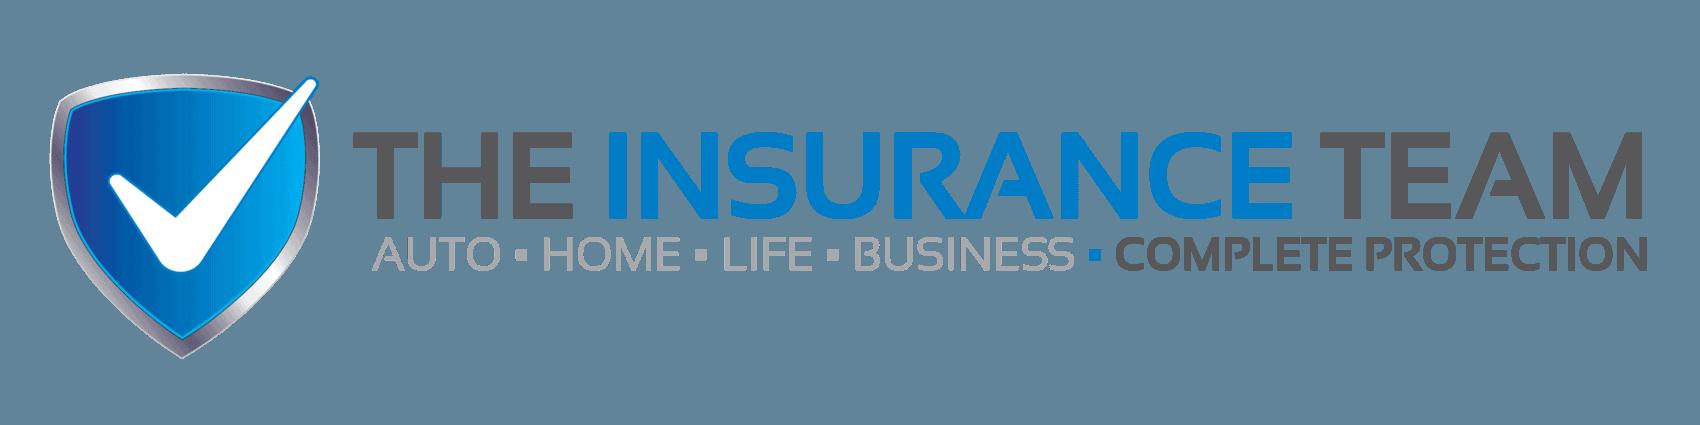 Insurance Team